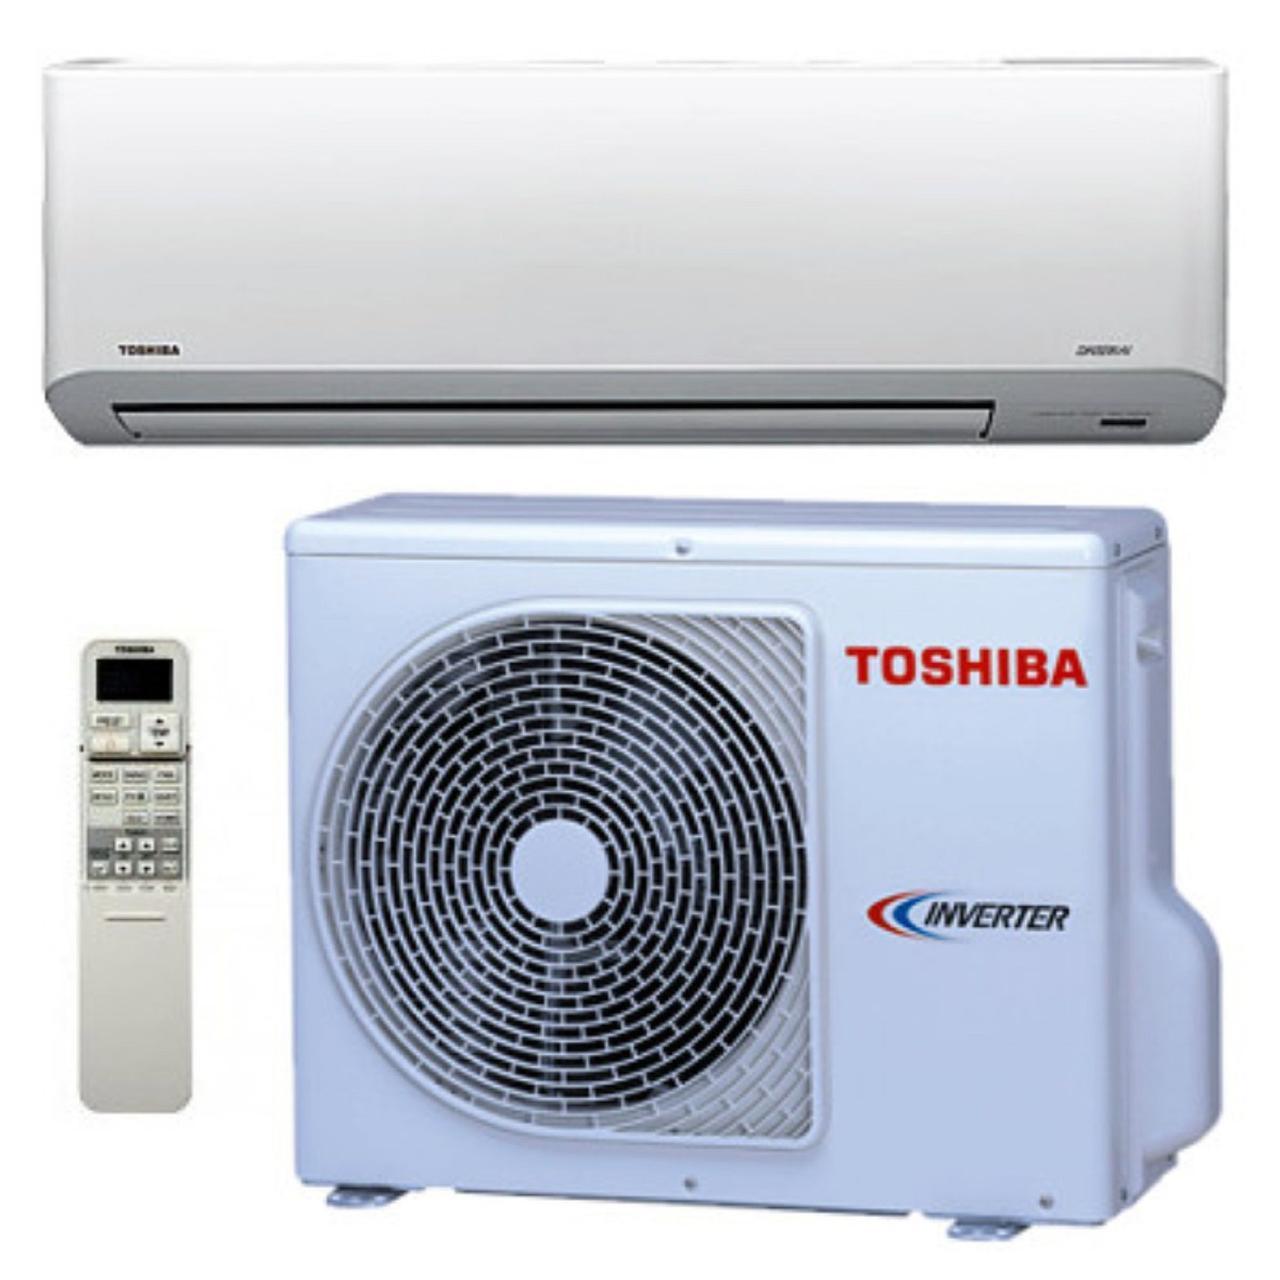 Інверторний кондиціонер Toshiba RAS-18N3KV-E/RAS-18N3AV-E2